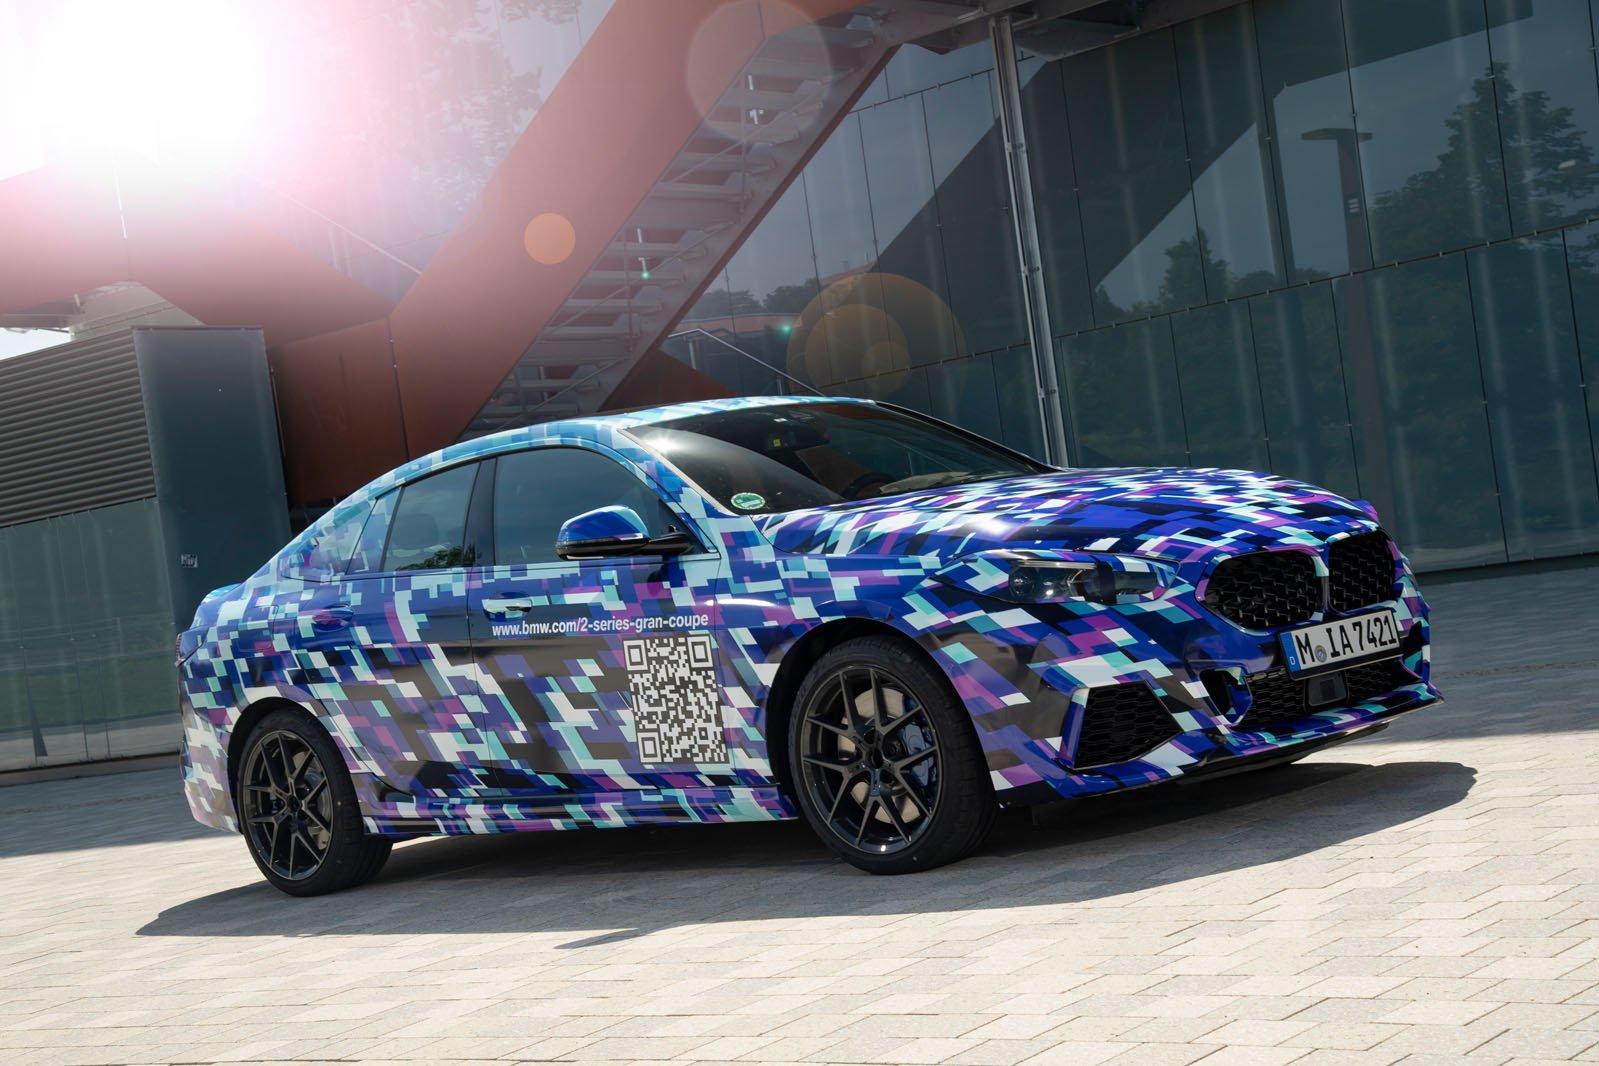 BMW 2 Series Gran Coupé front